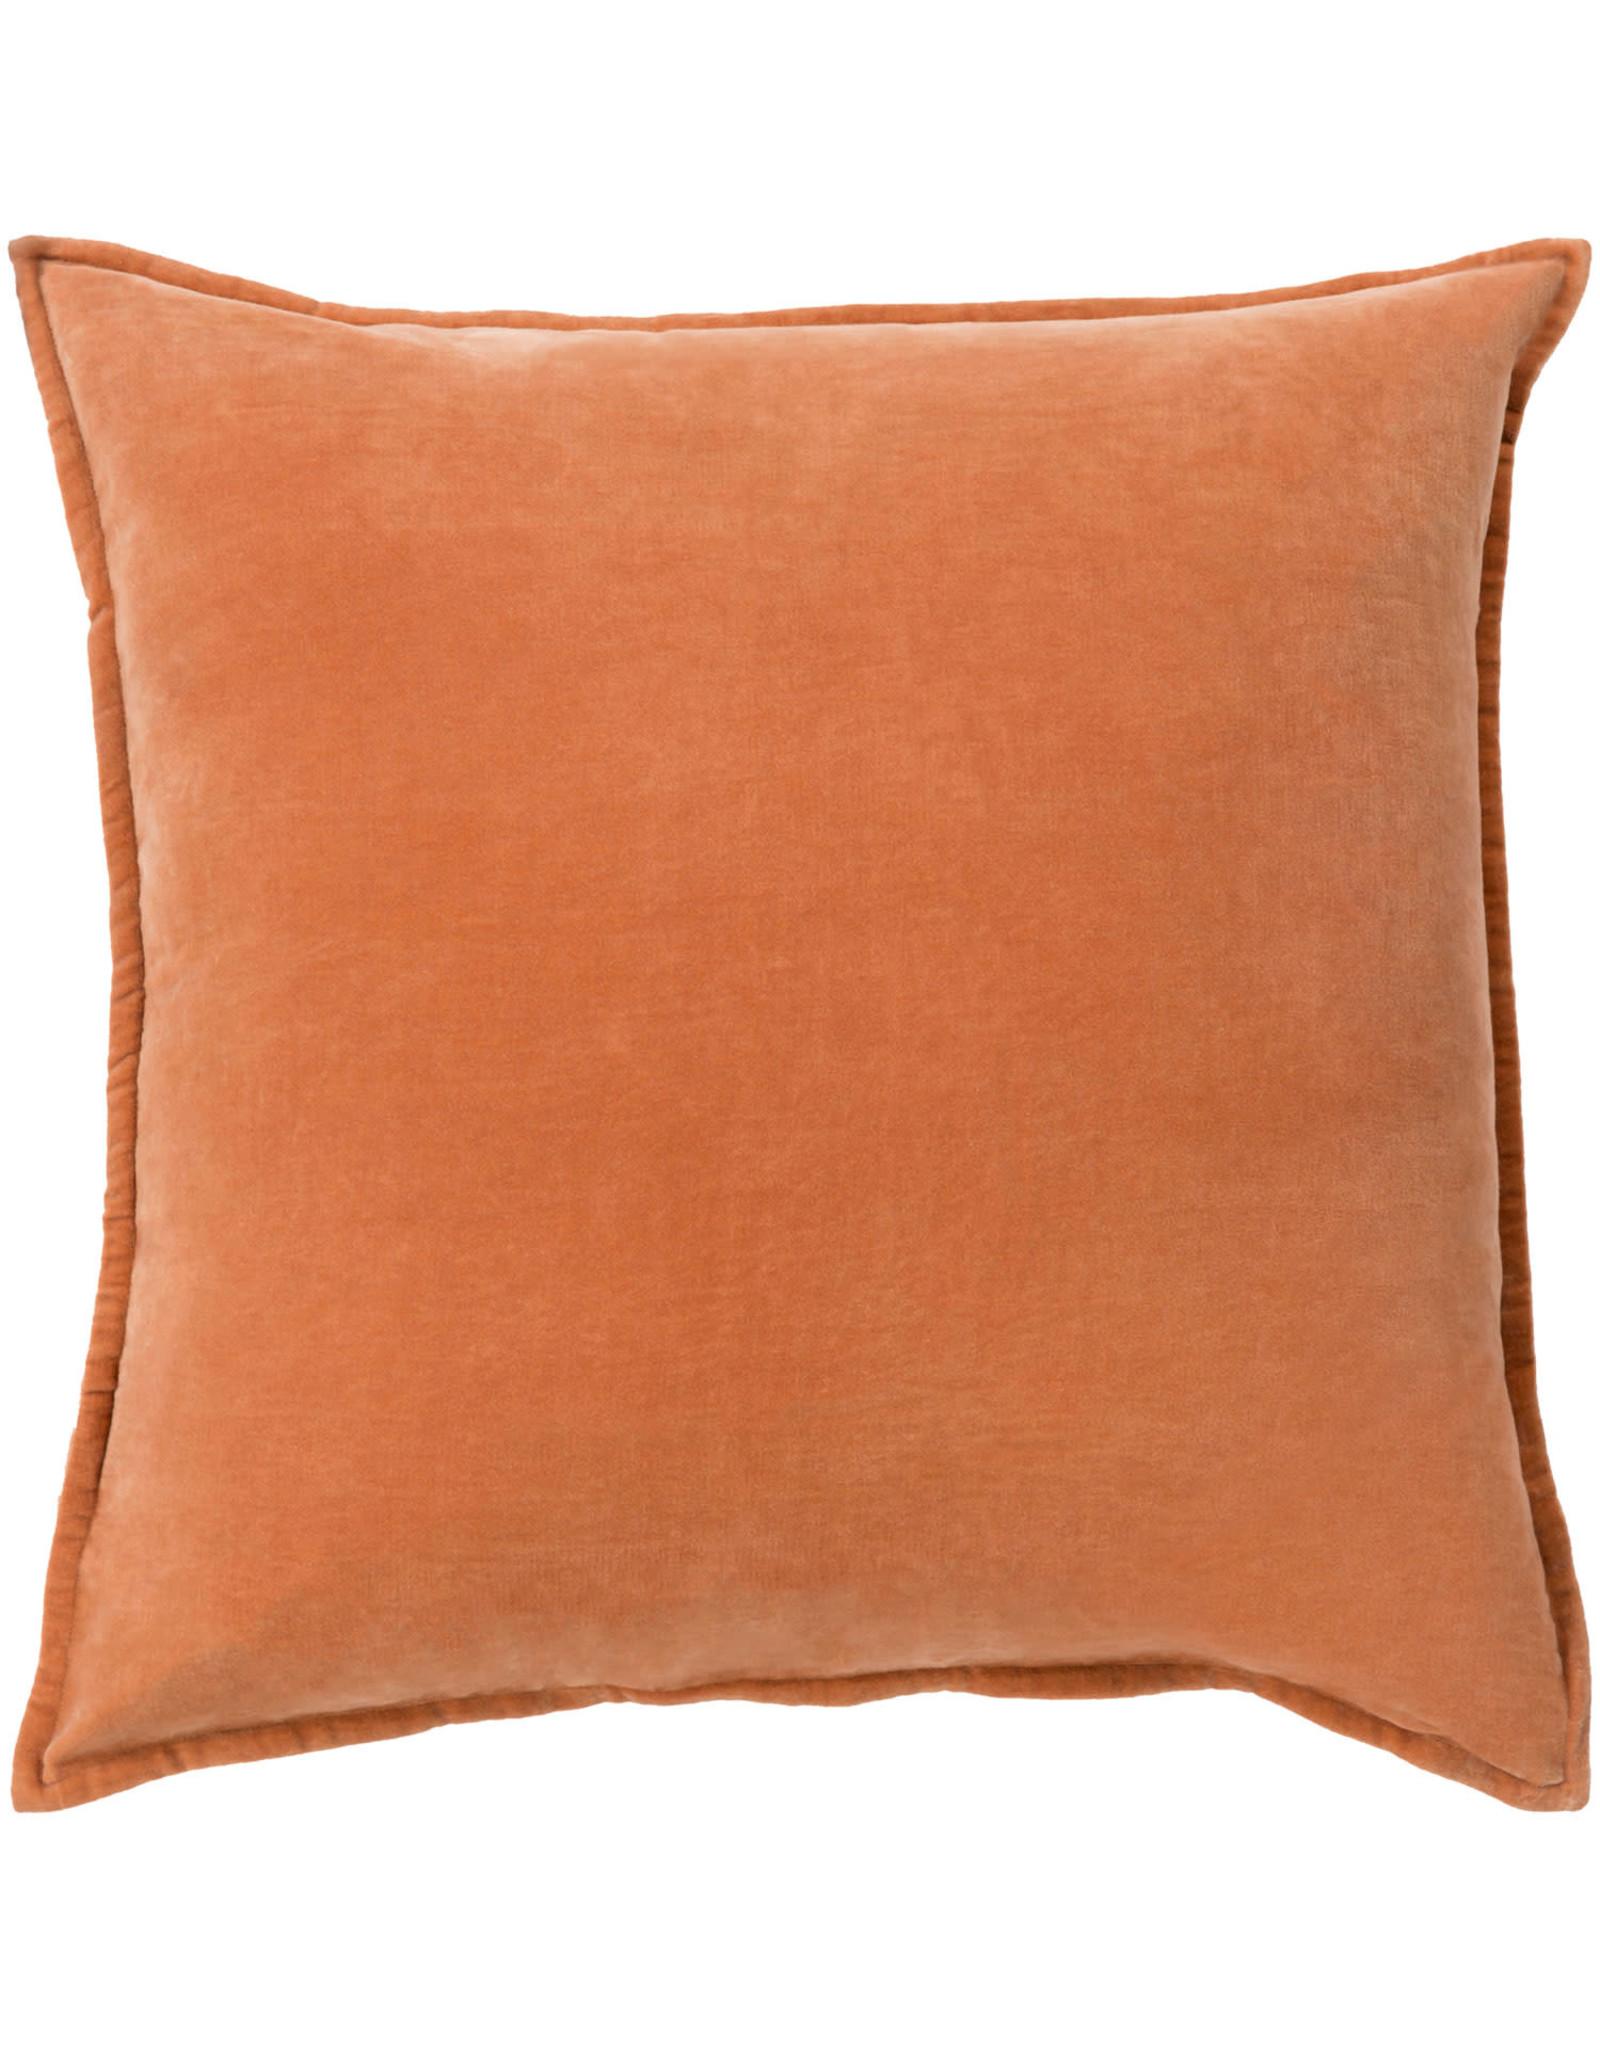 Surya Velvet Pillow 18x18 - Orange